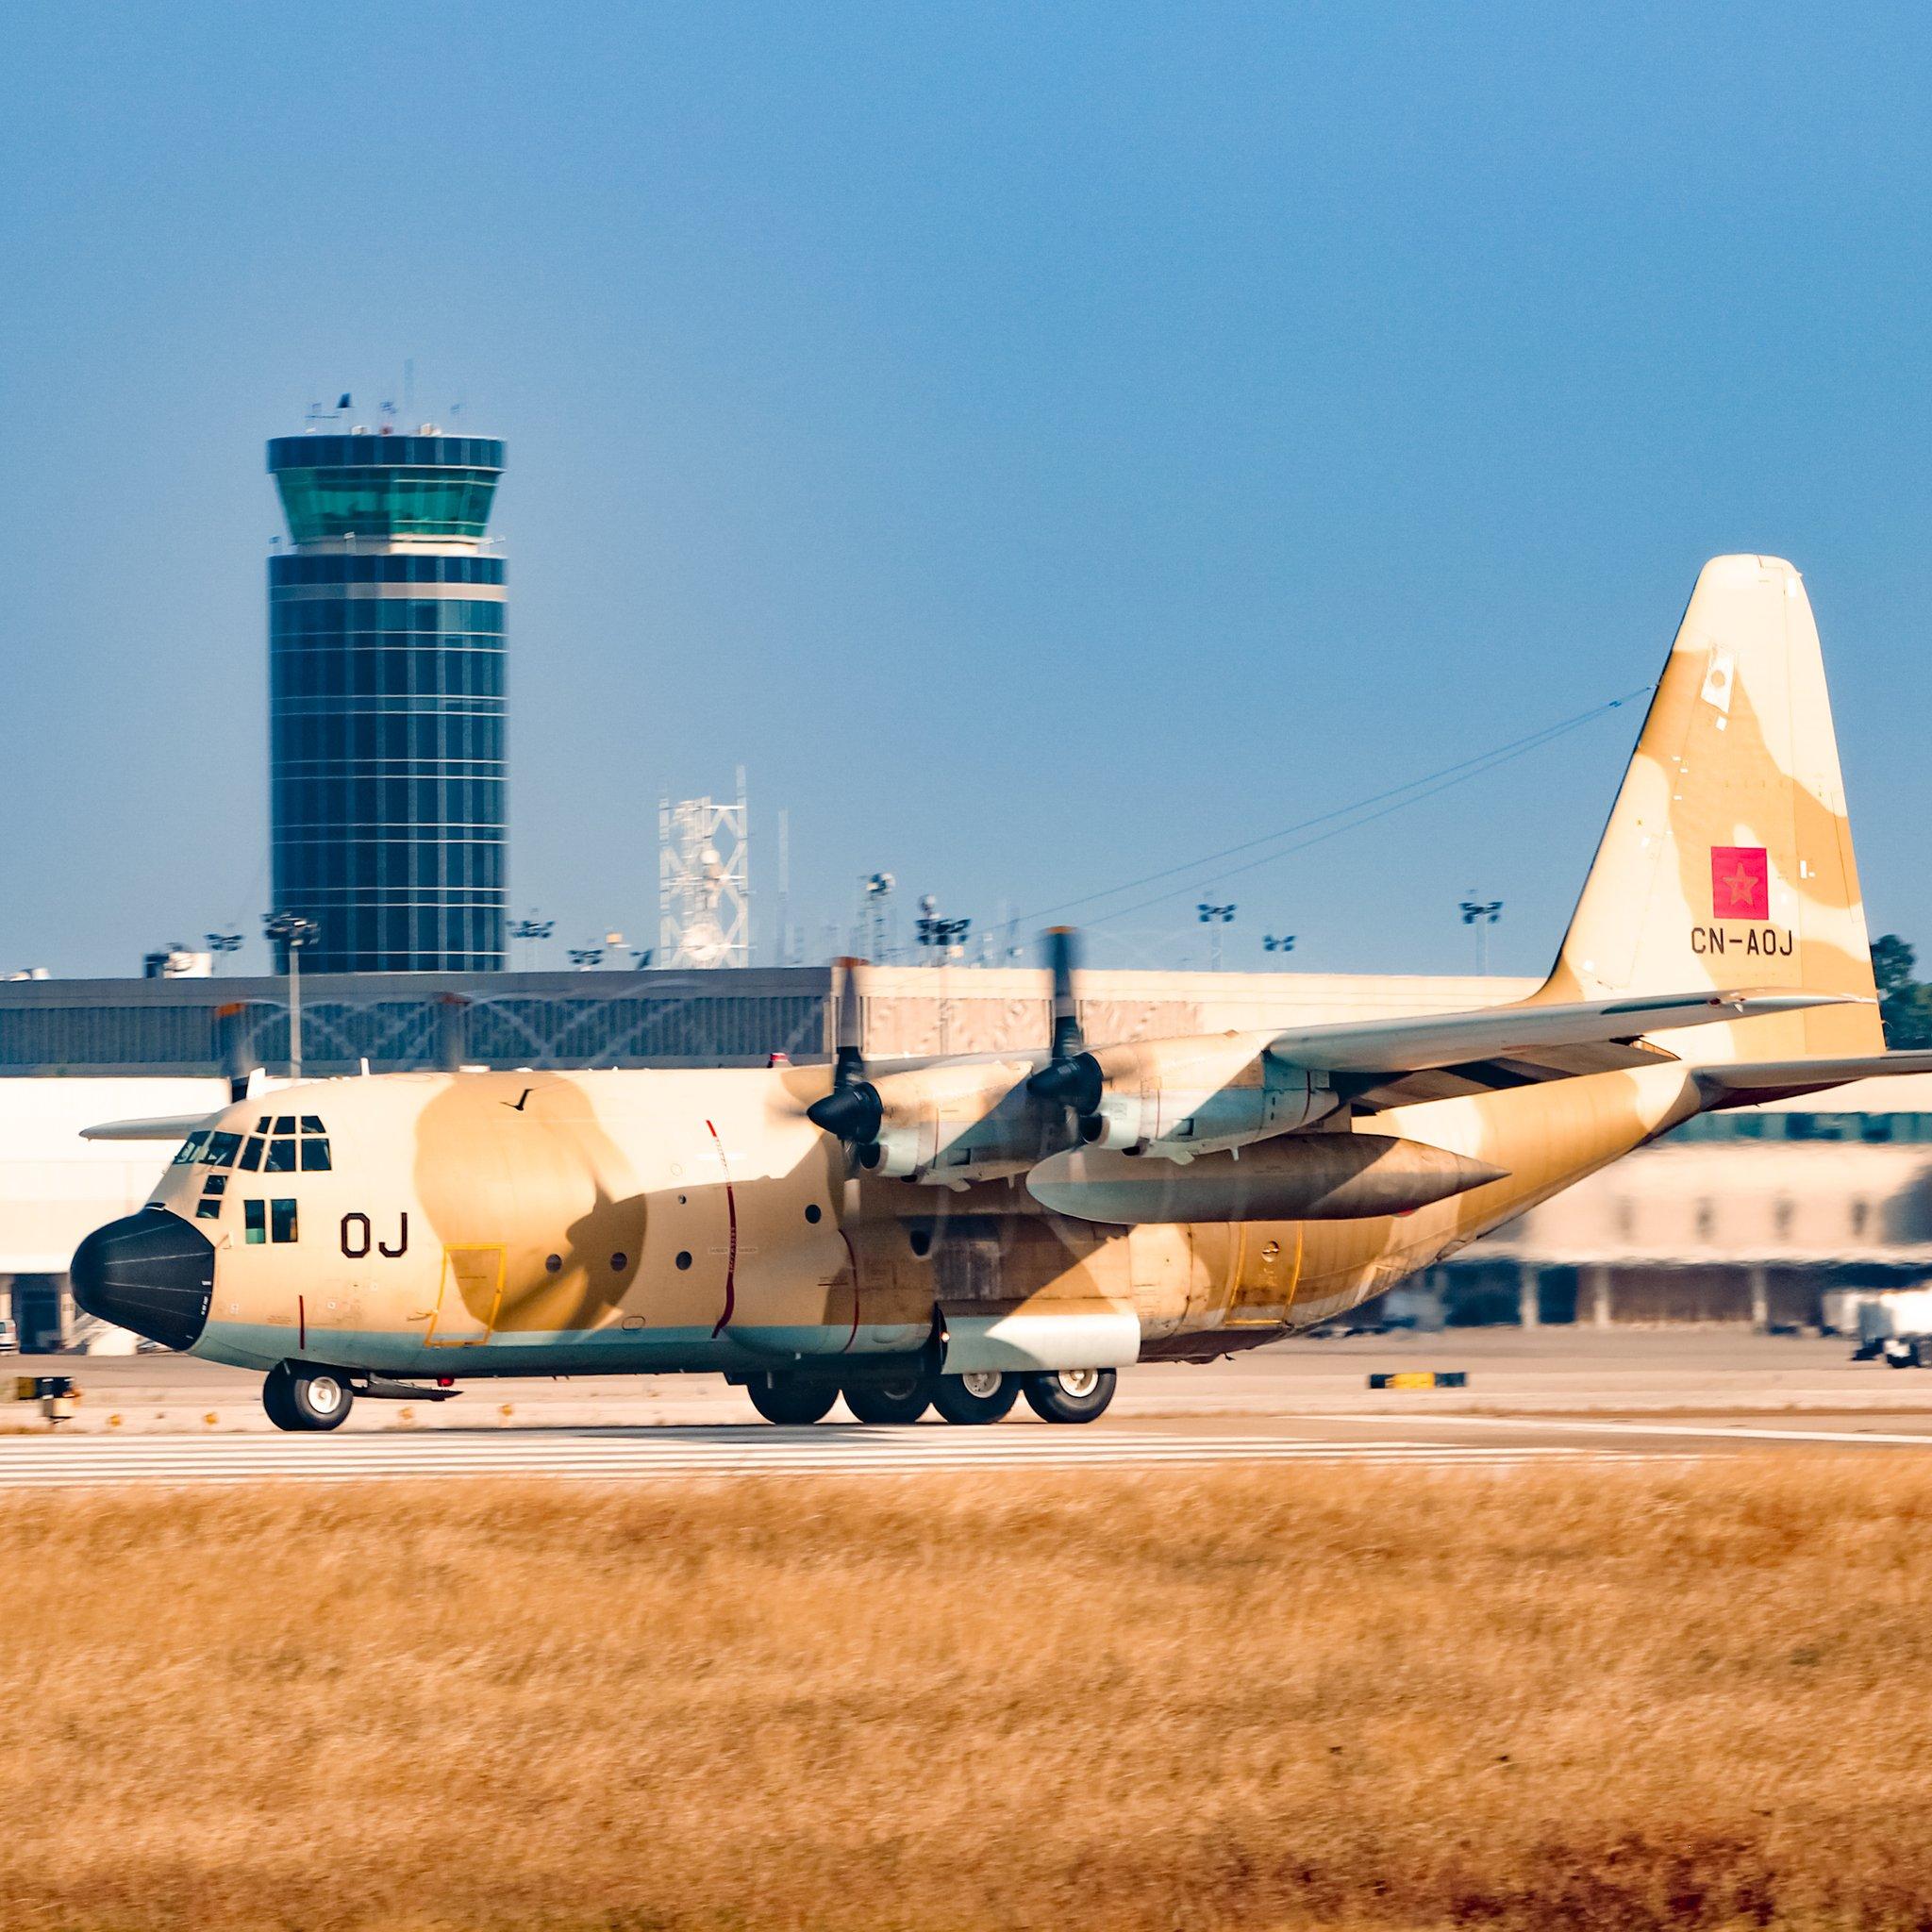 FRA: Photos d'avions de transport - Page 40 Ee6tob10